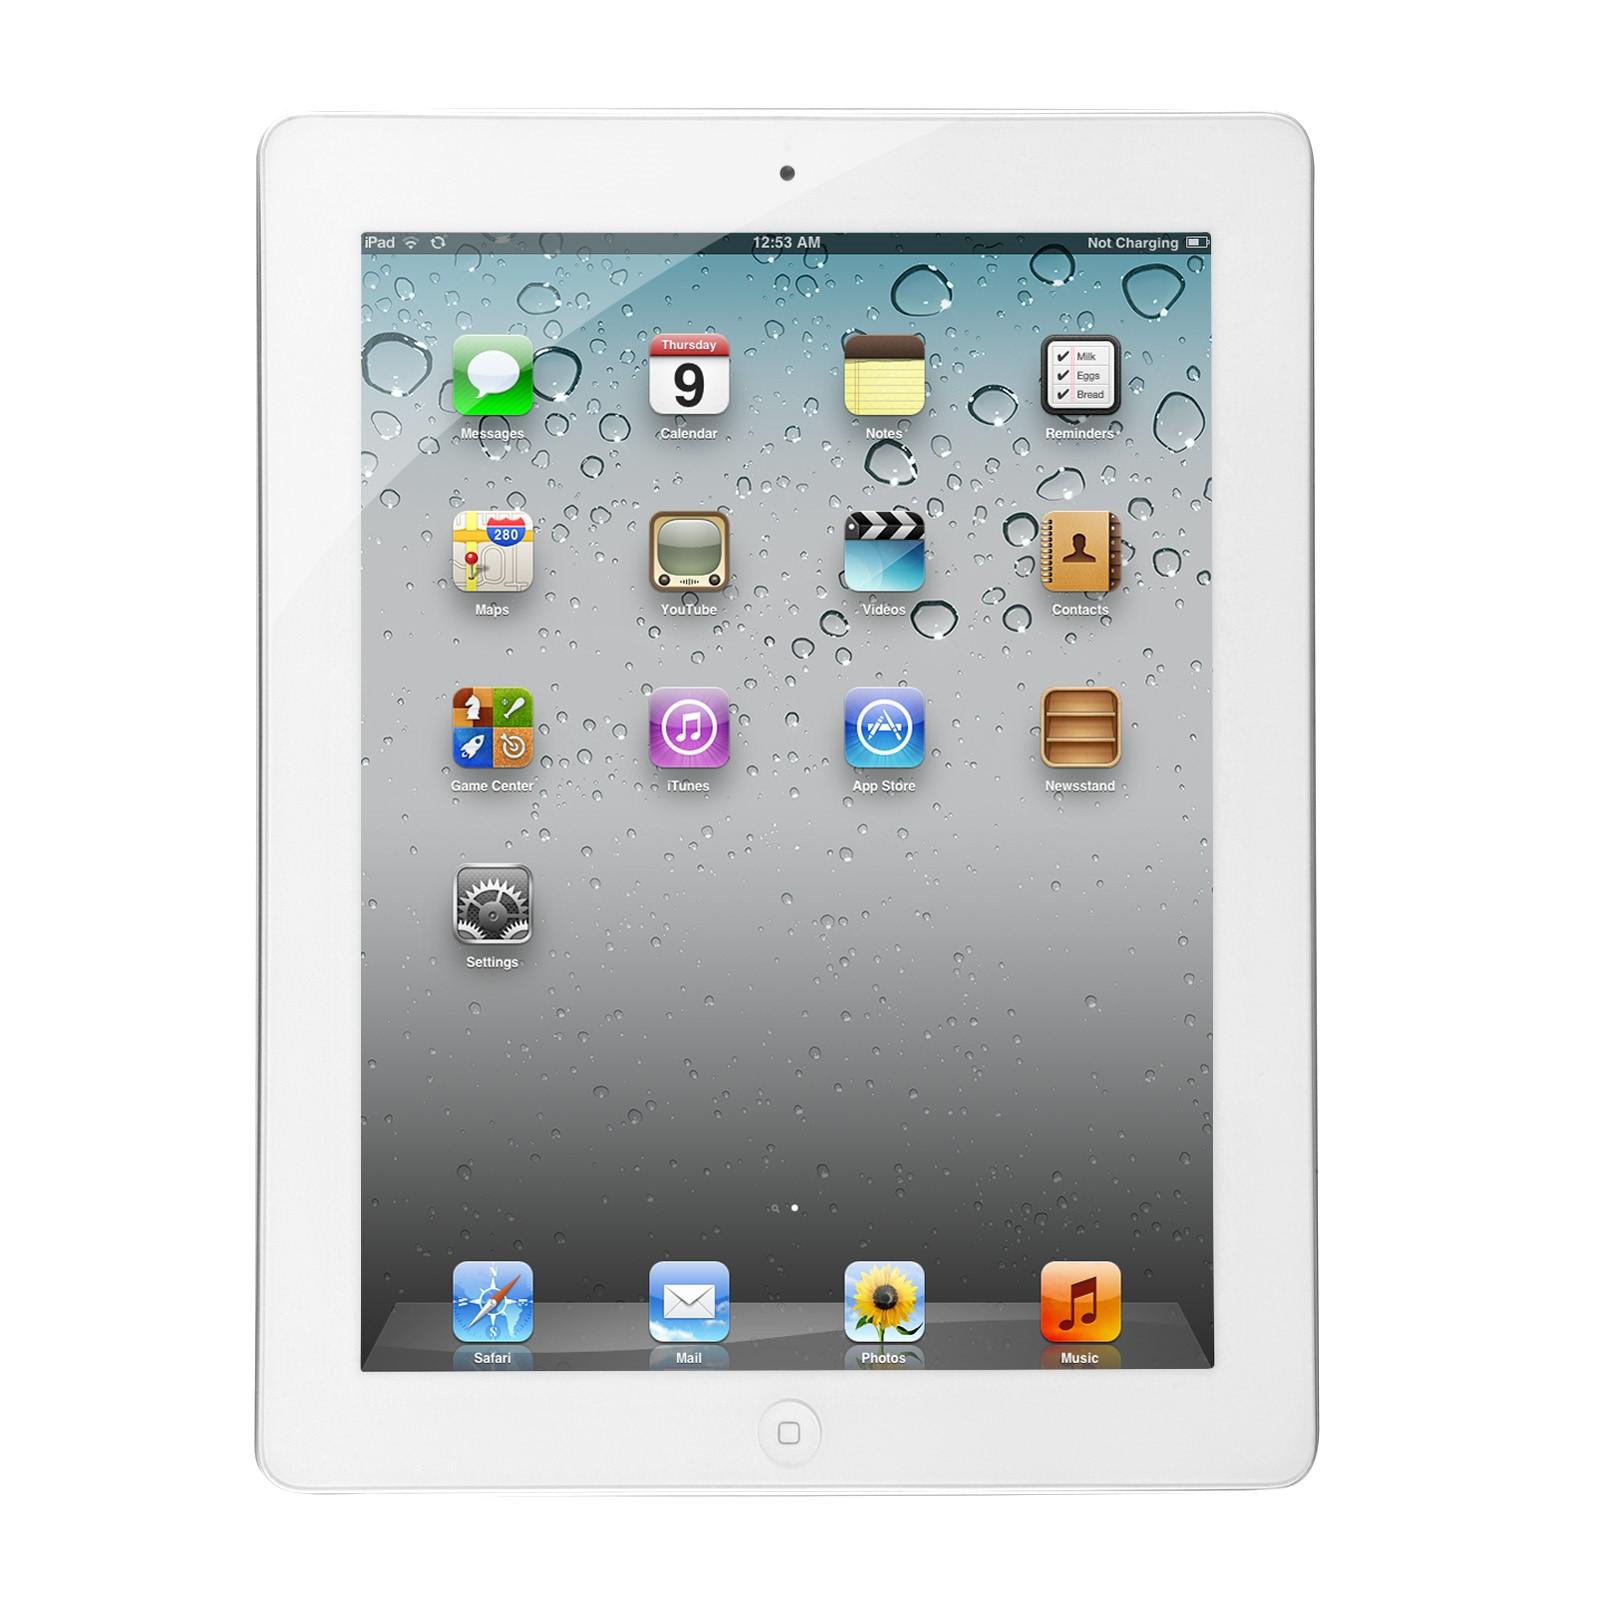 Apple iPad 2 Verizon Tablet 16GB White